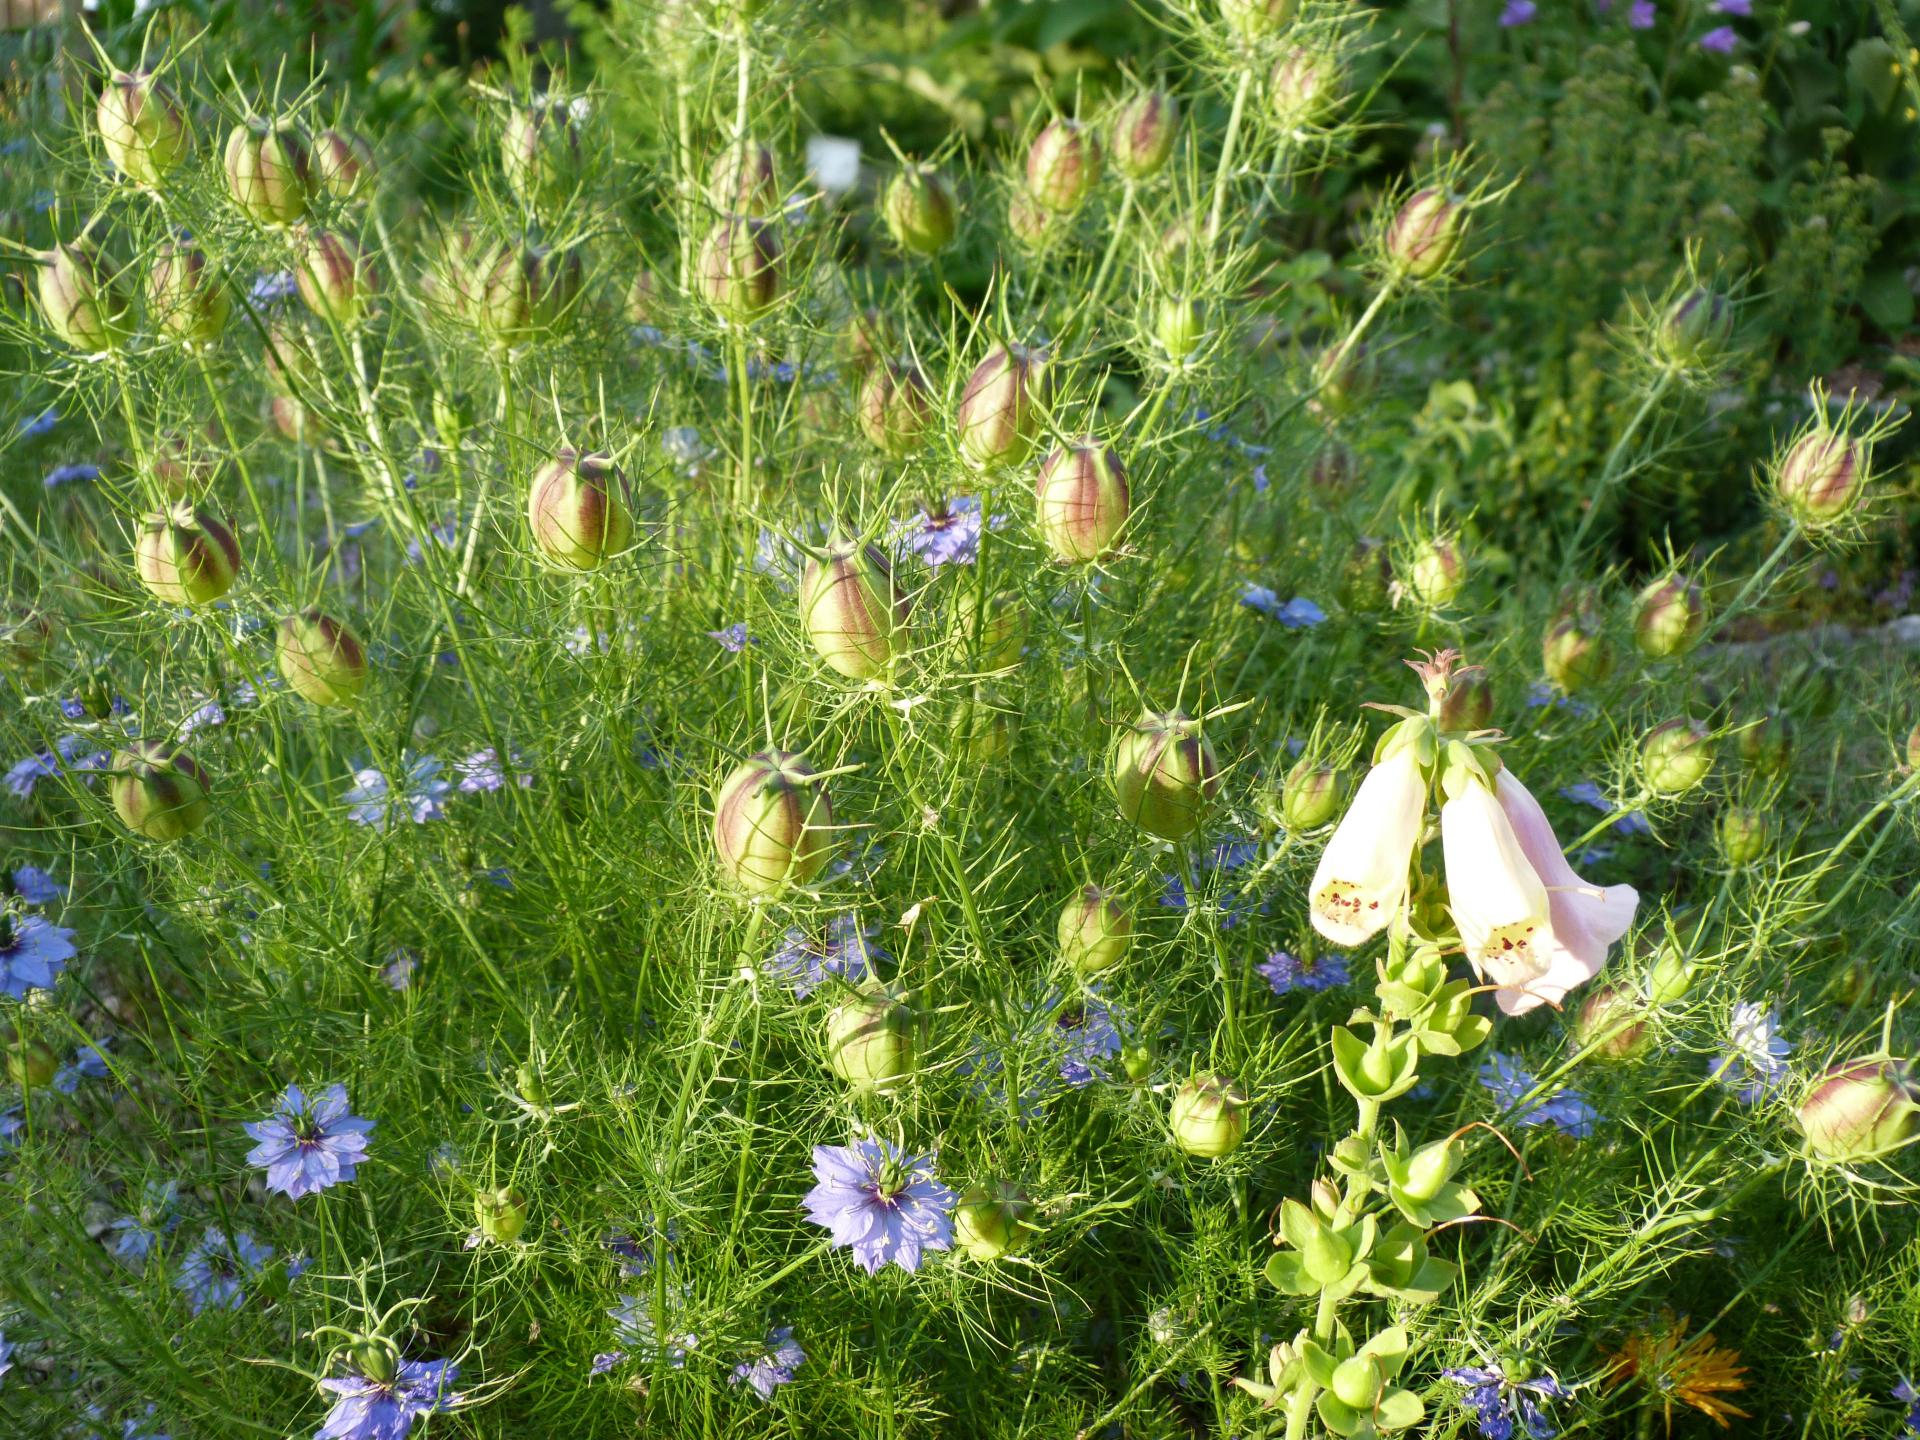 Jardinles especes nigelledamas 21